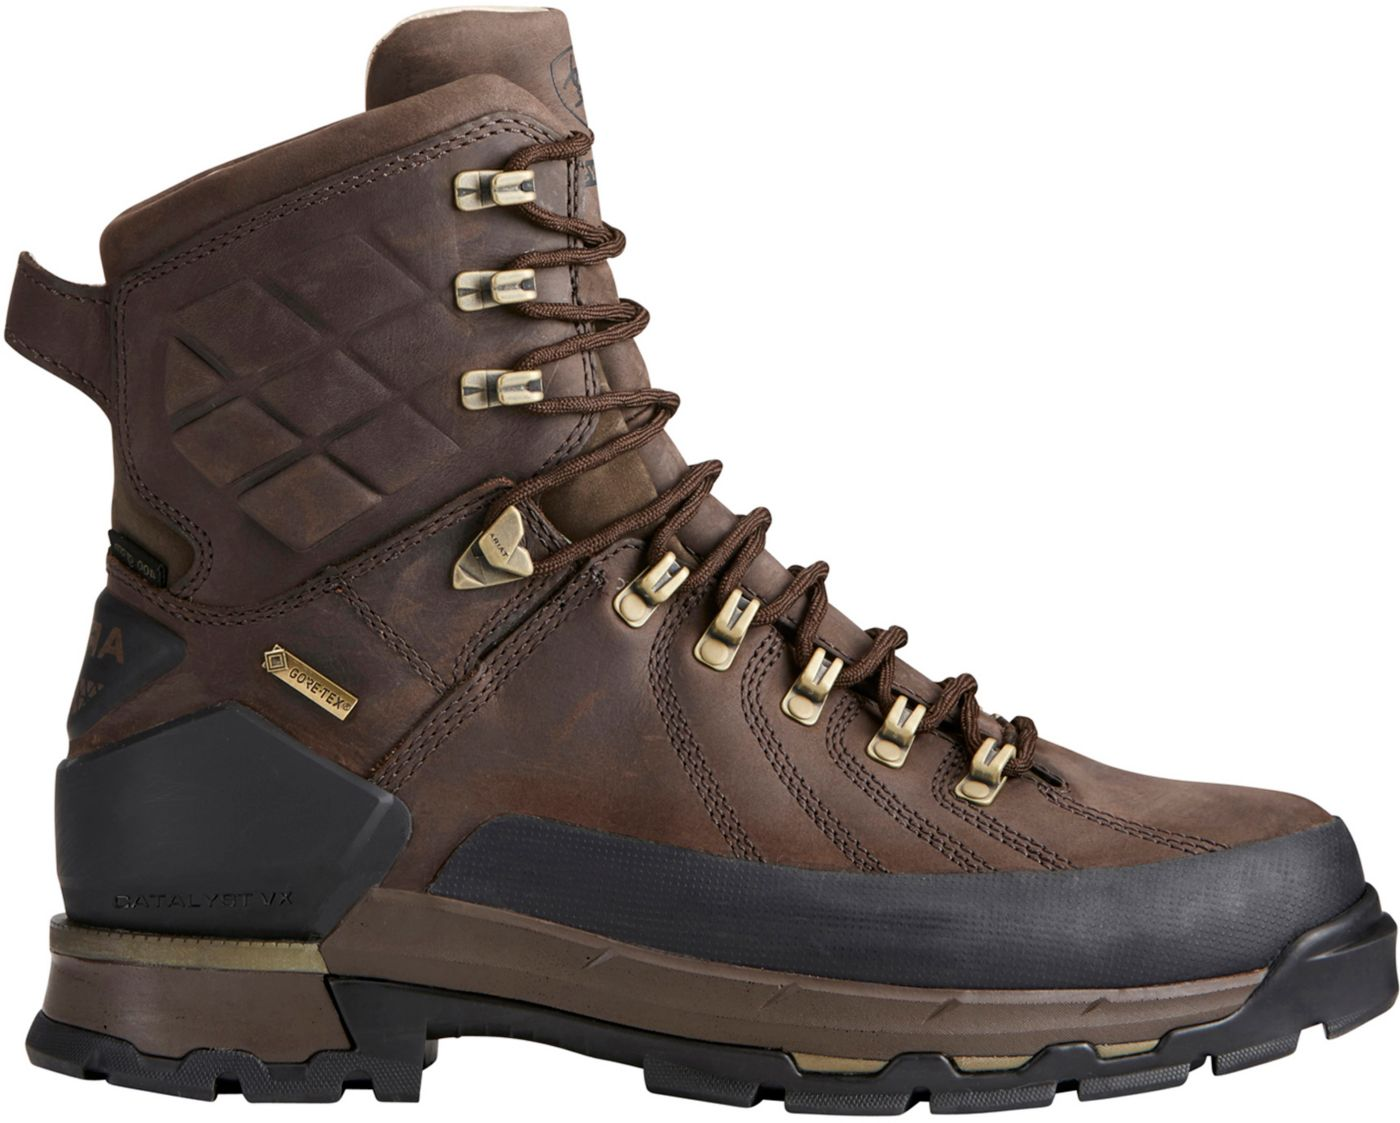 Ariat Men's Catalyst Defiant 8'' 400g Waterproof Field Hunting Boots